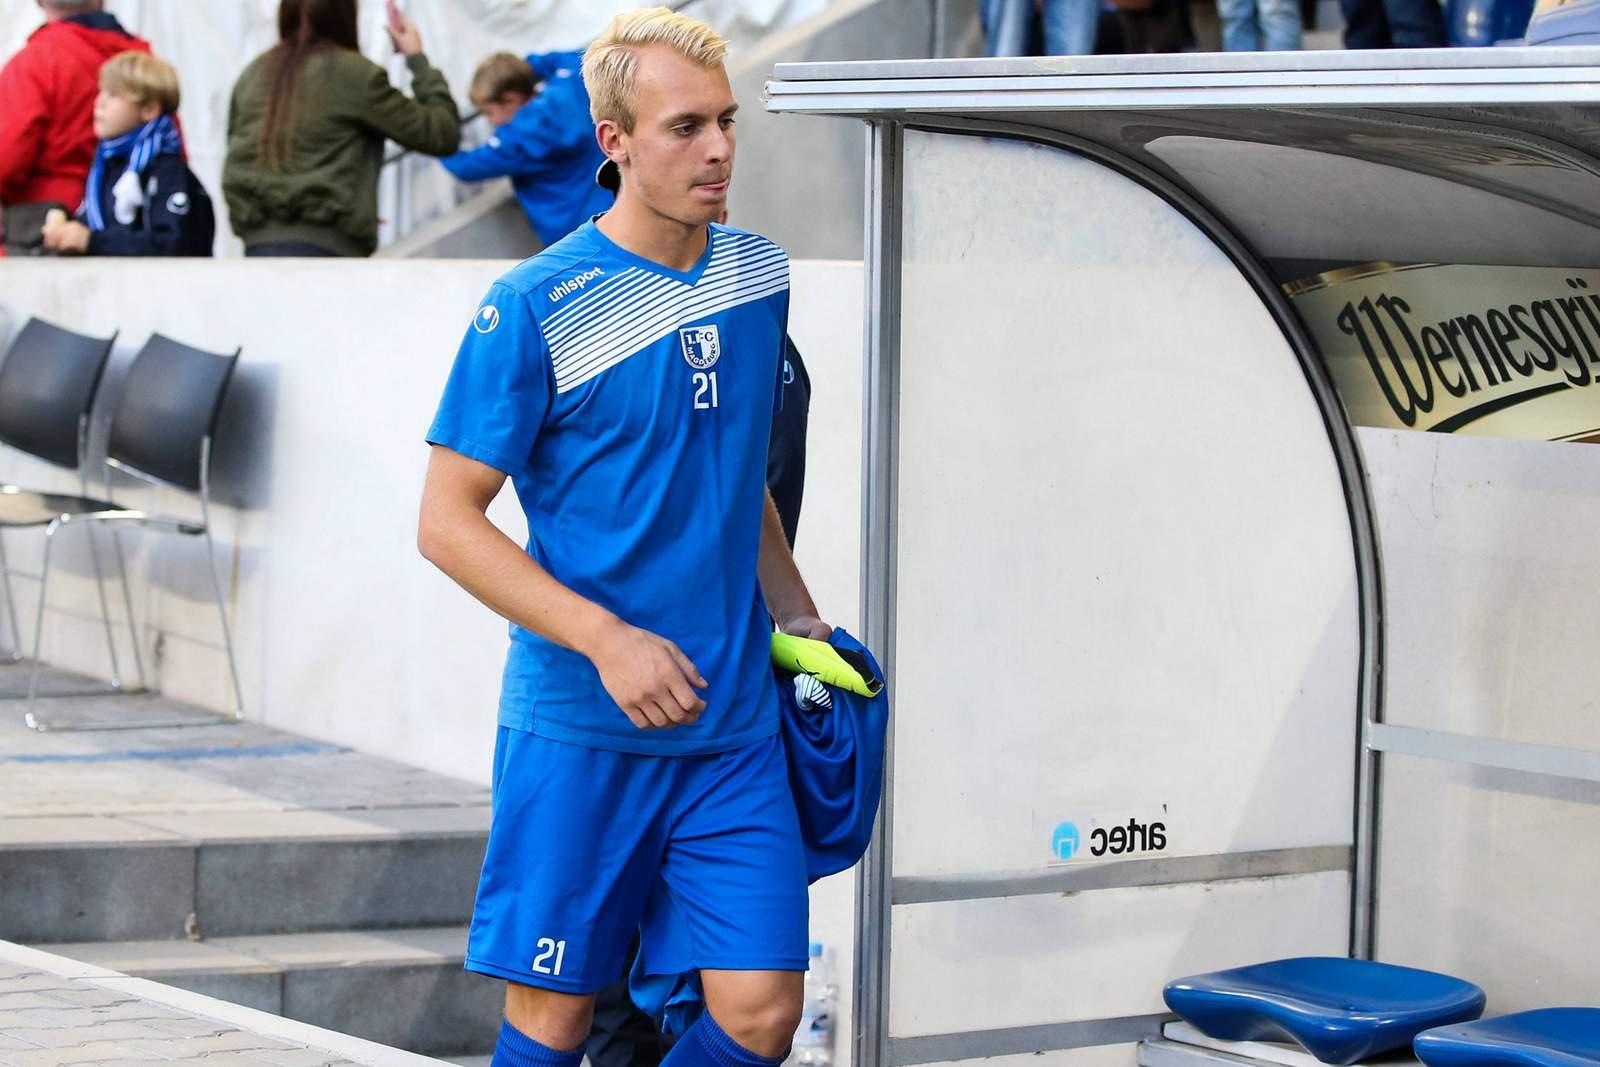 Julius Düker vom 1.FC Magdeburg